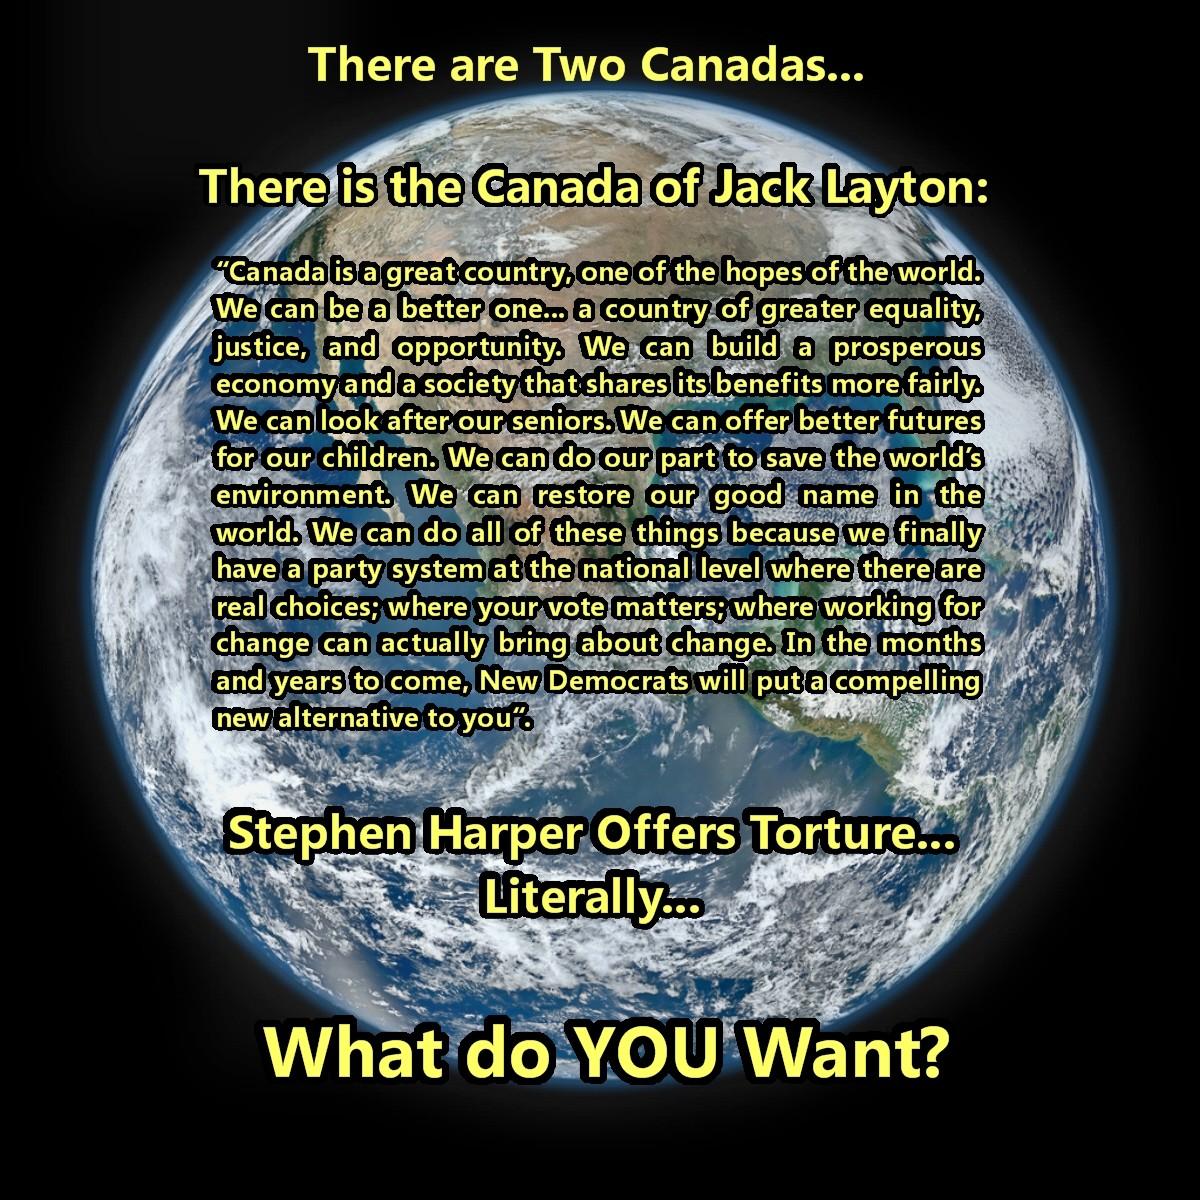 Barbara-Marie Drezhlo. There are Two Canadas. 2012